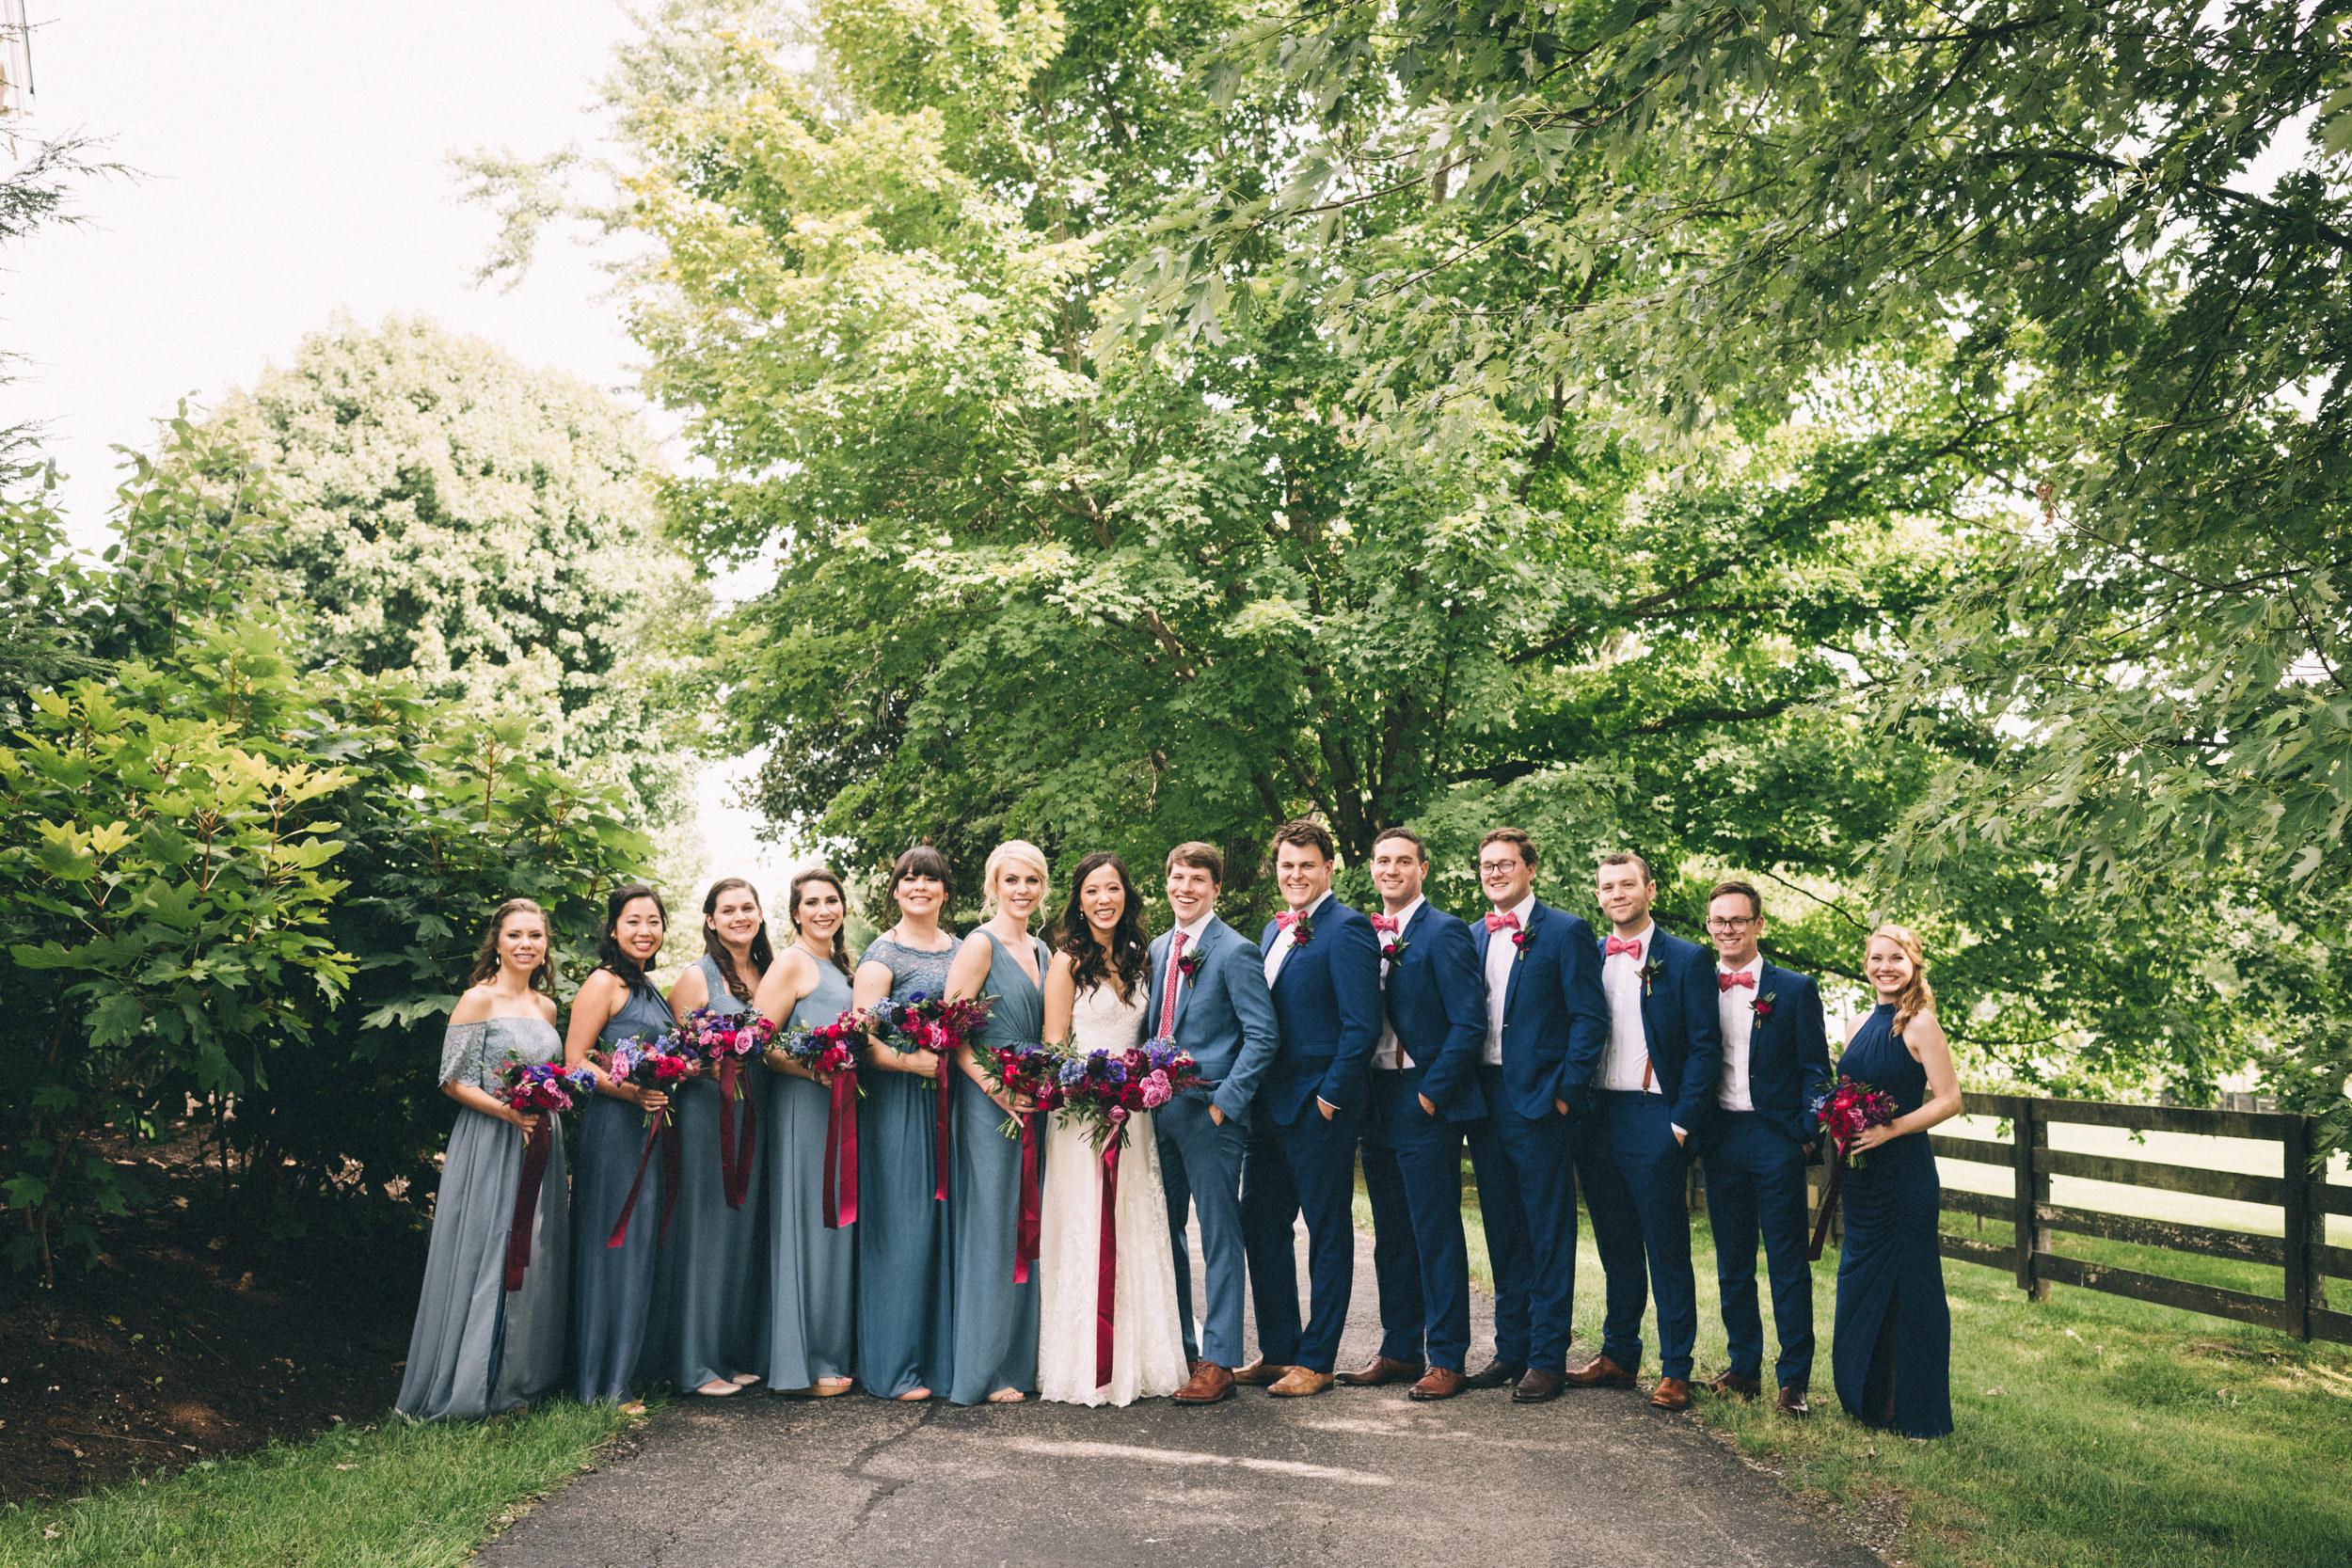 Louisville-Kentucky-Wedding-and-Elopement-Photographer-Sarah-Katherine-Davis-Photography-Summer-Jewel-Toned-Wedding-Chineese-Tea-Ceremony-Warrenwood-Manor-Danville-253.jpg